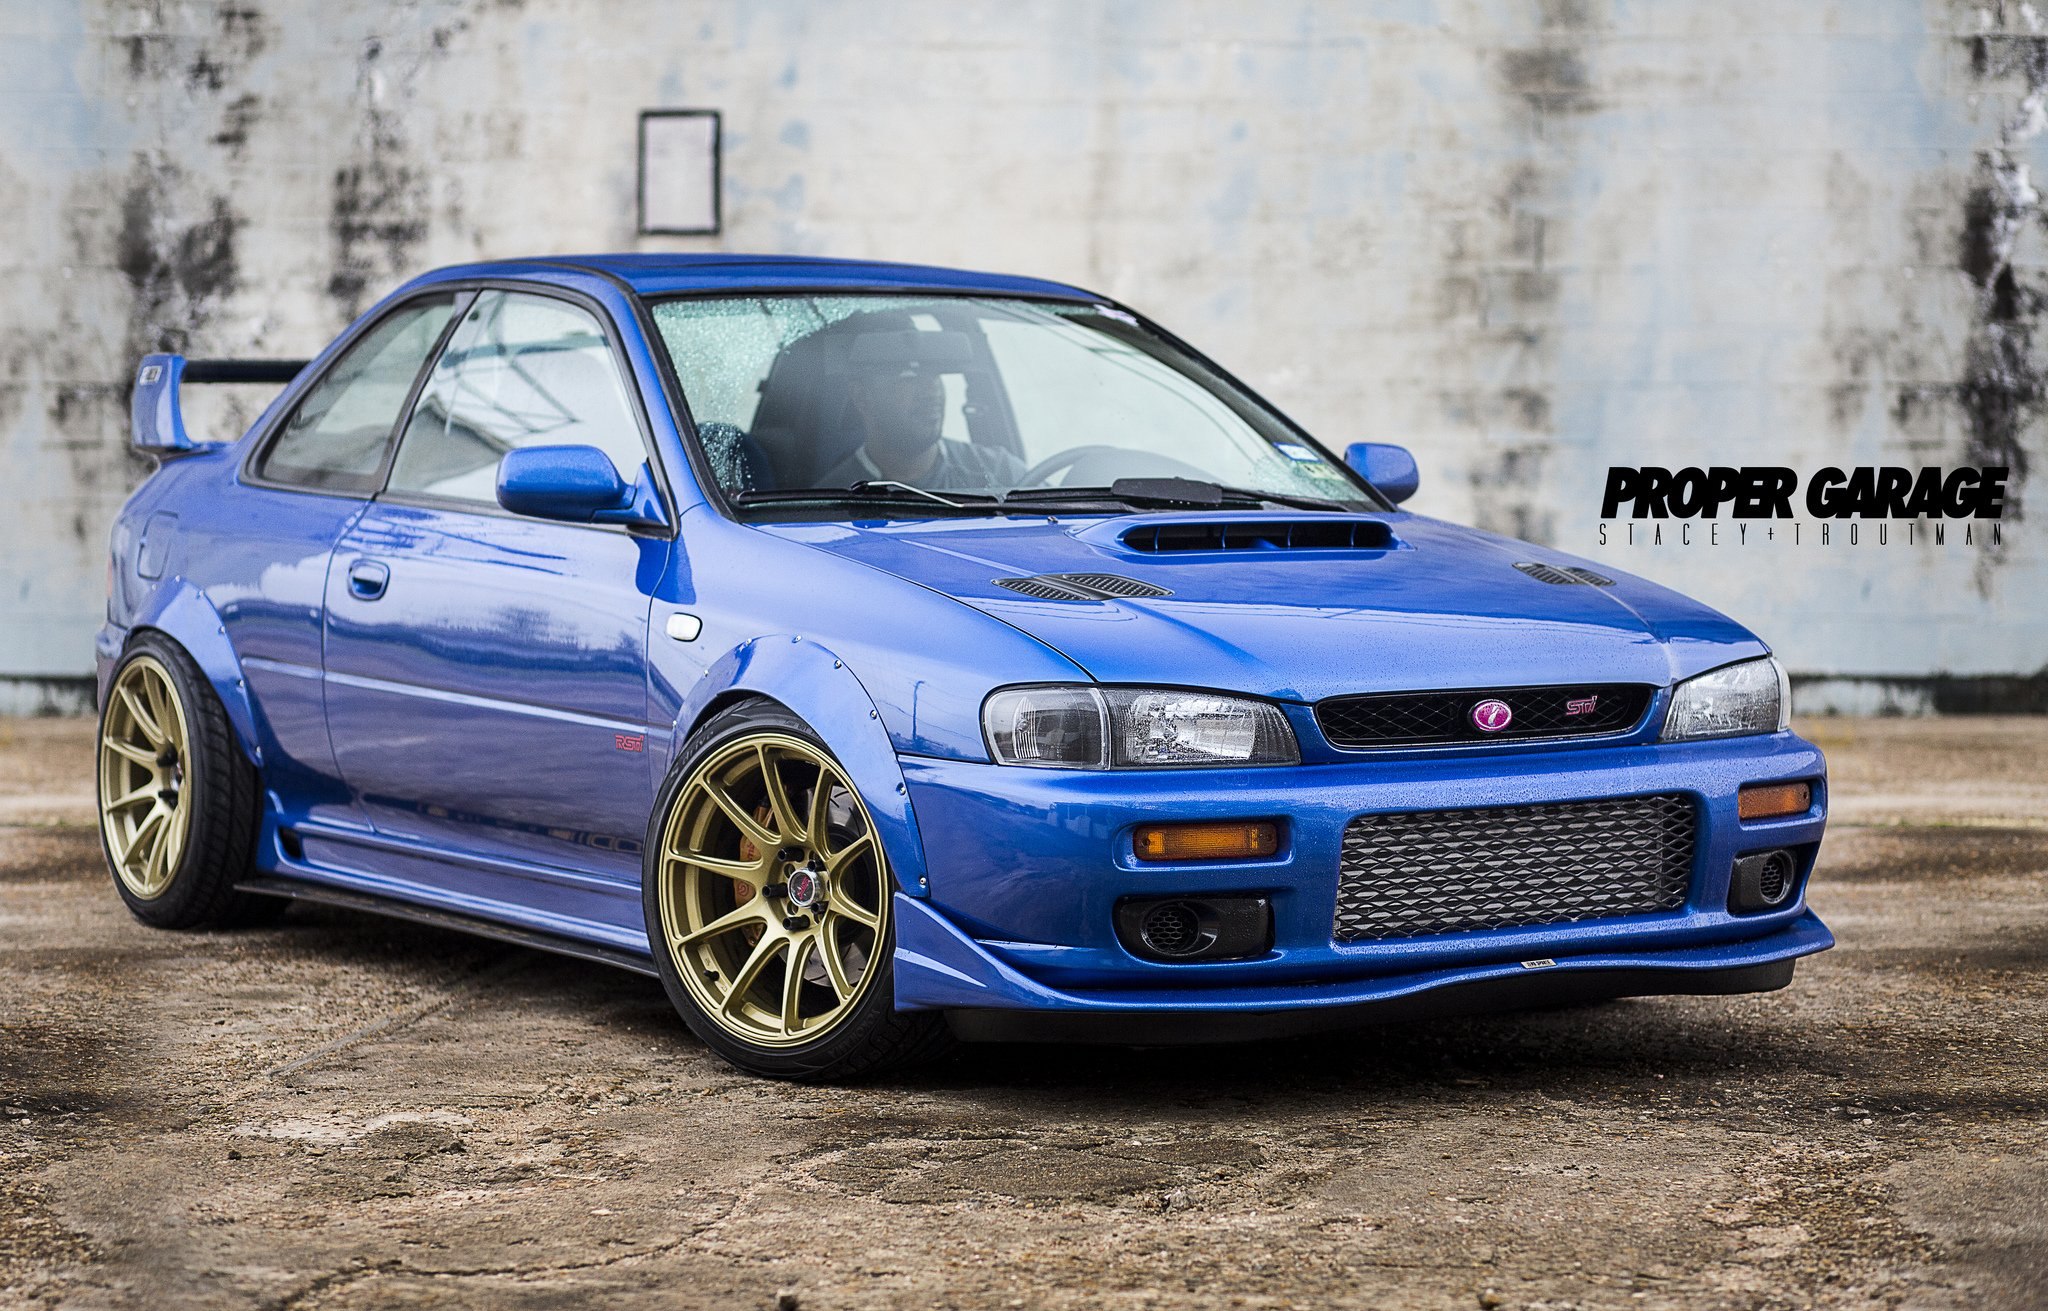 2014 Subaru Wrx Sti Hatchback >> Subaru impreza wrx sportcars rallycars cars hatchback japan sedan tuning wallpaper | 2048x1311 ...